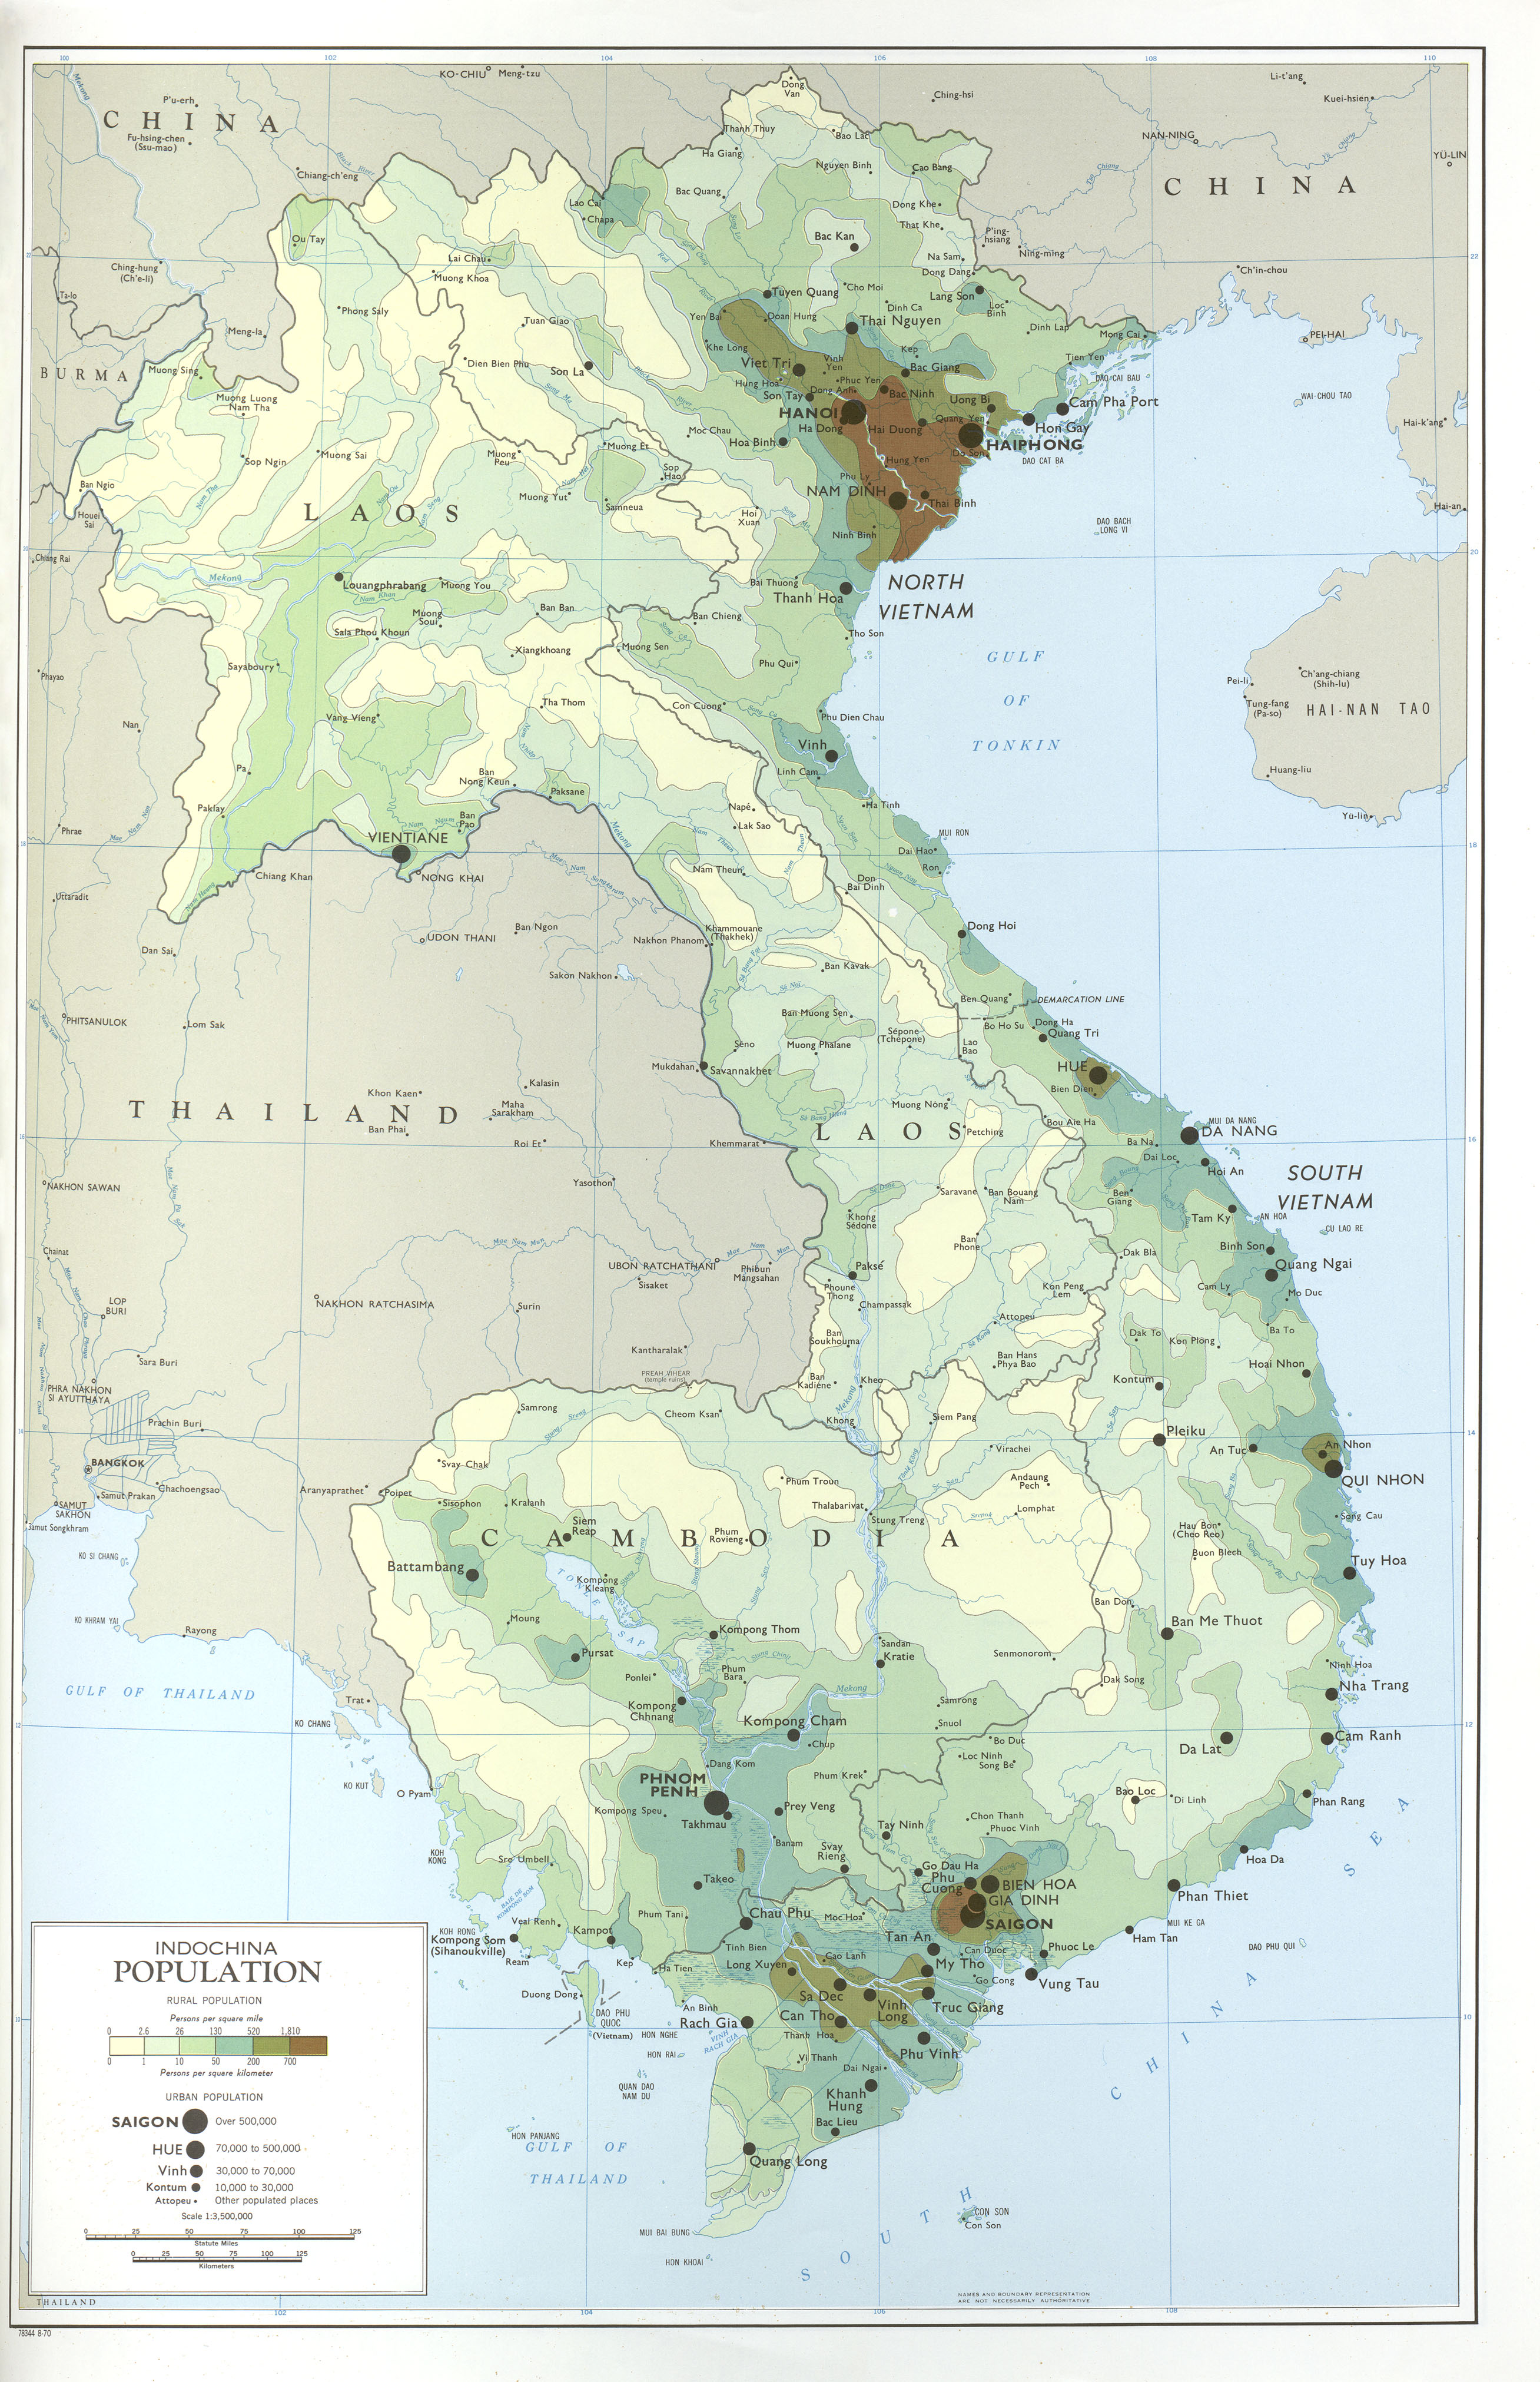 Indochina Population Map, October